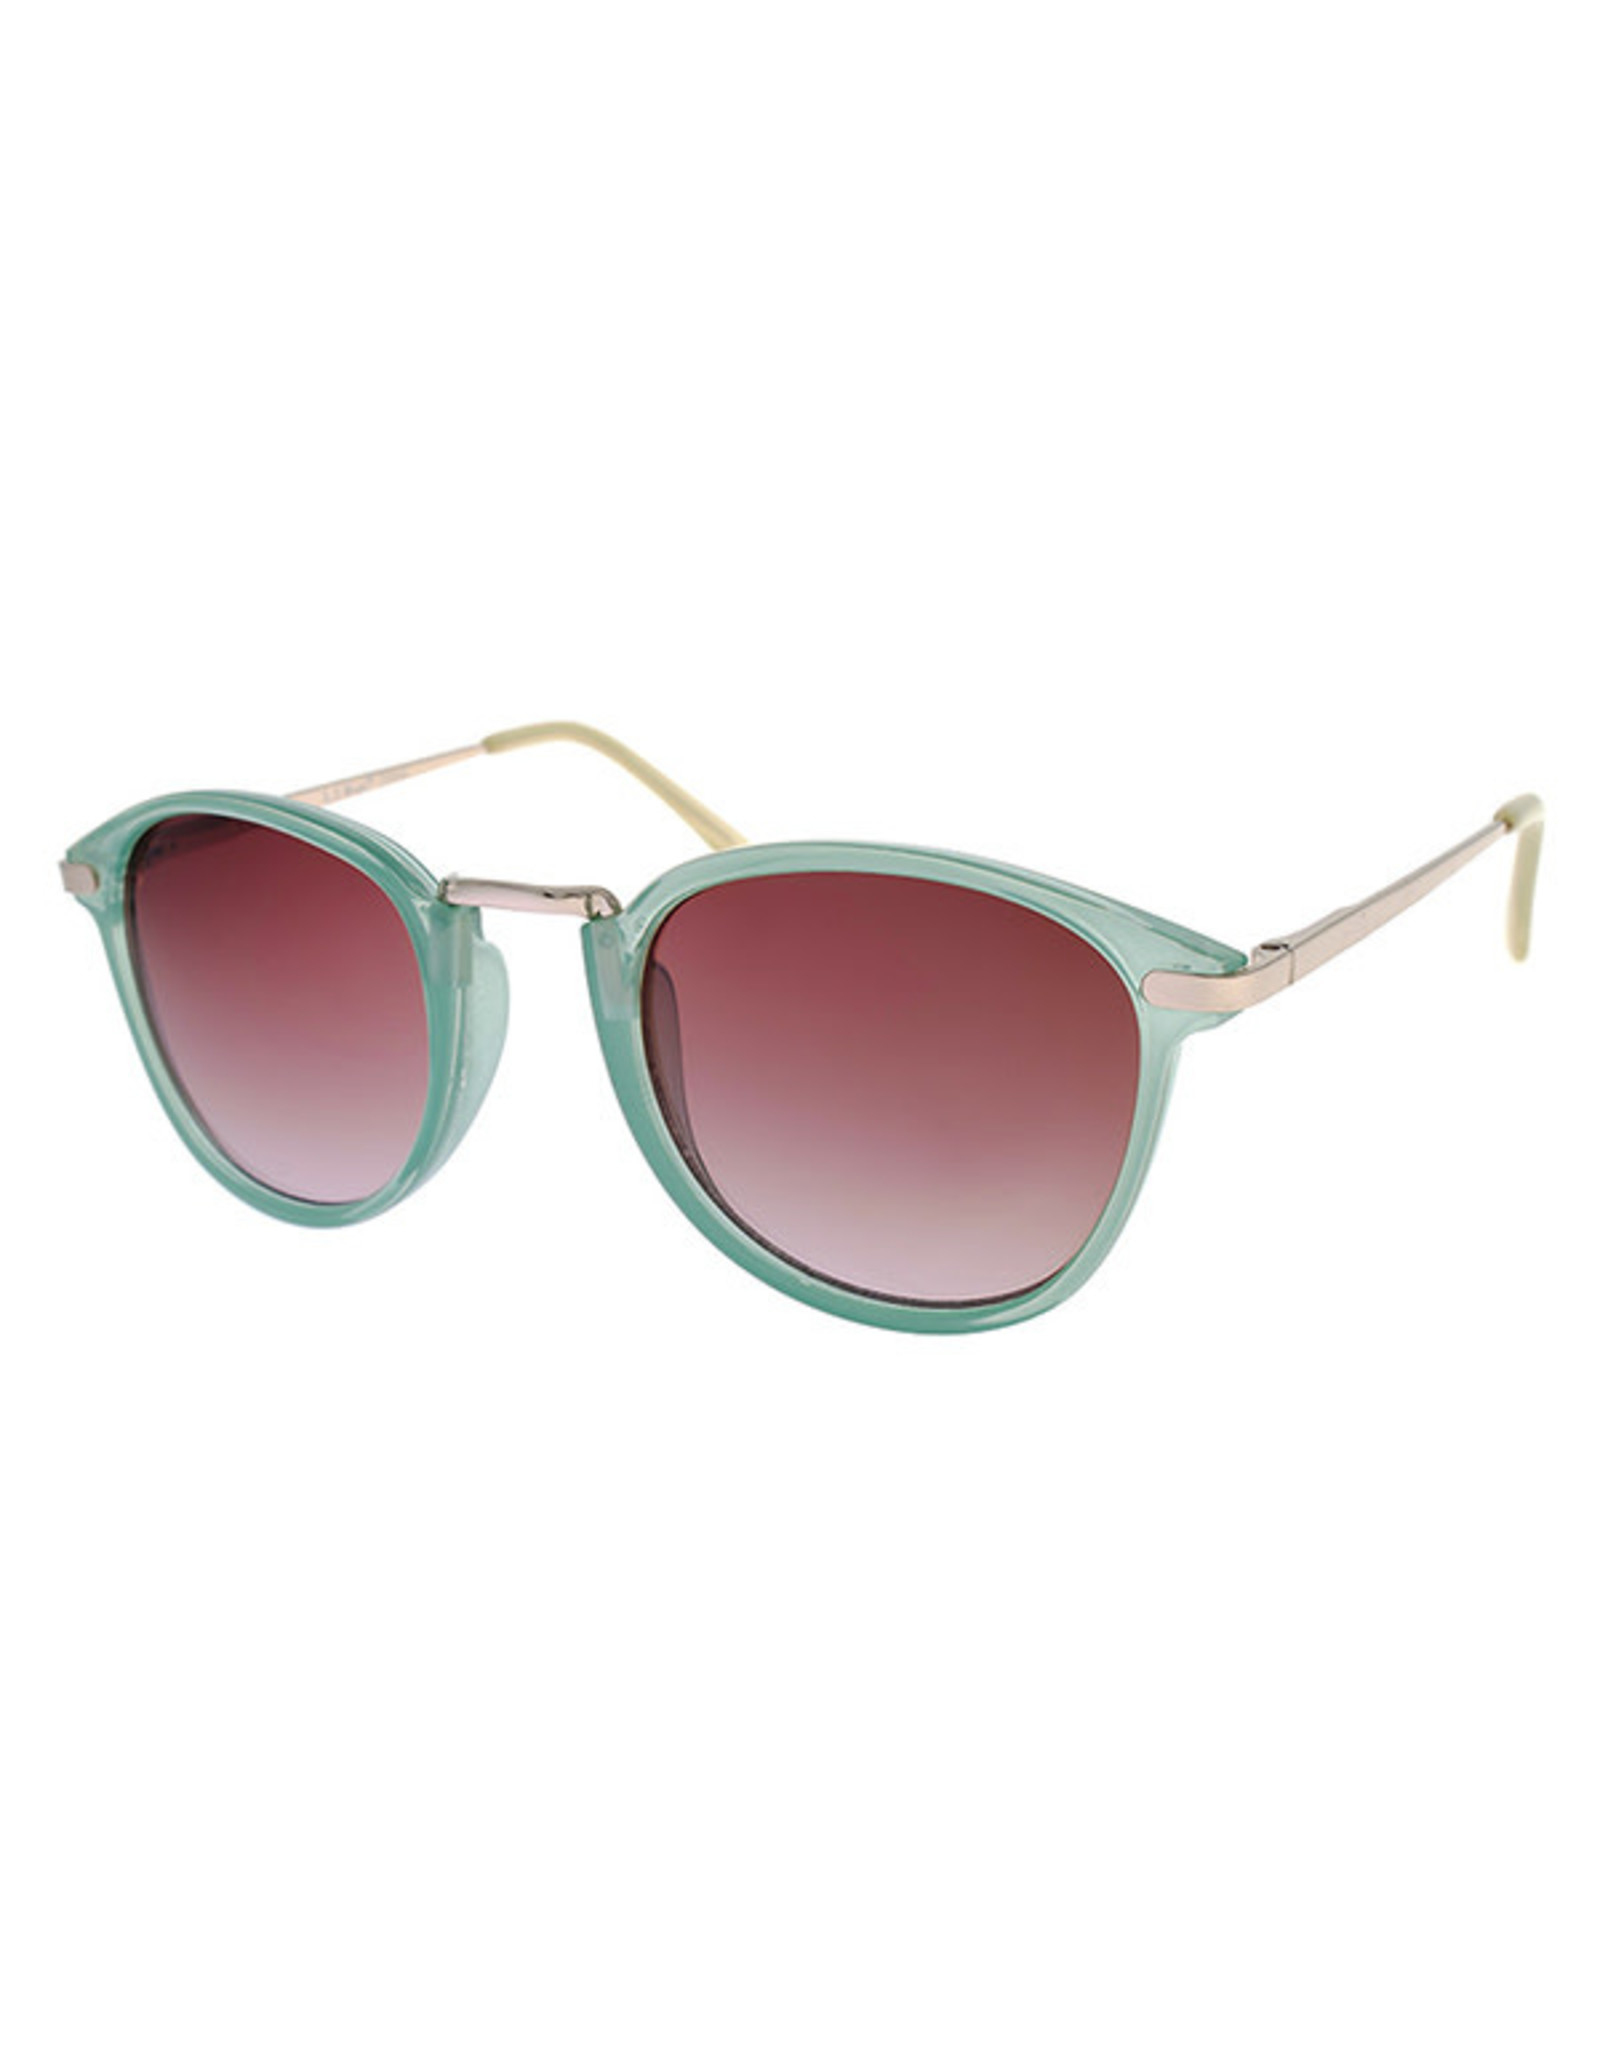 AJM - Round Wire Frame Sunglasses